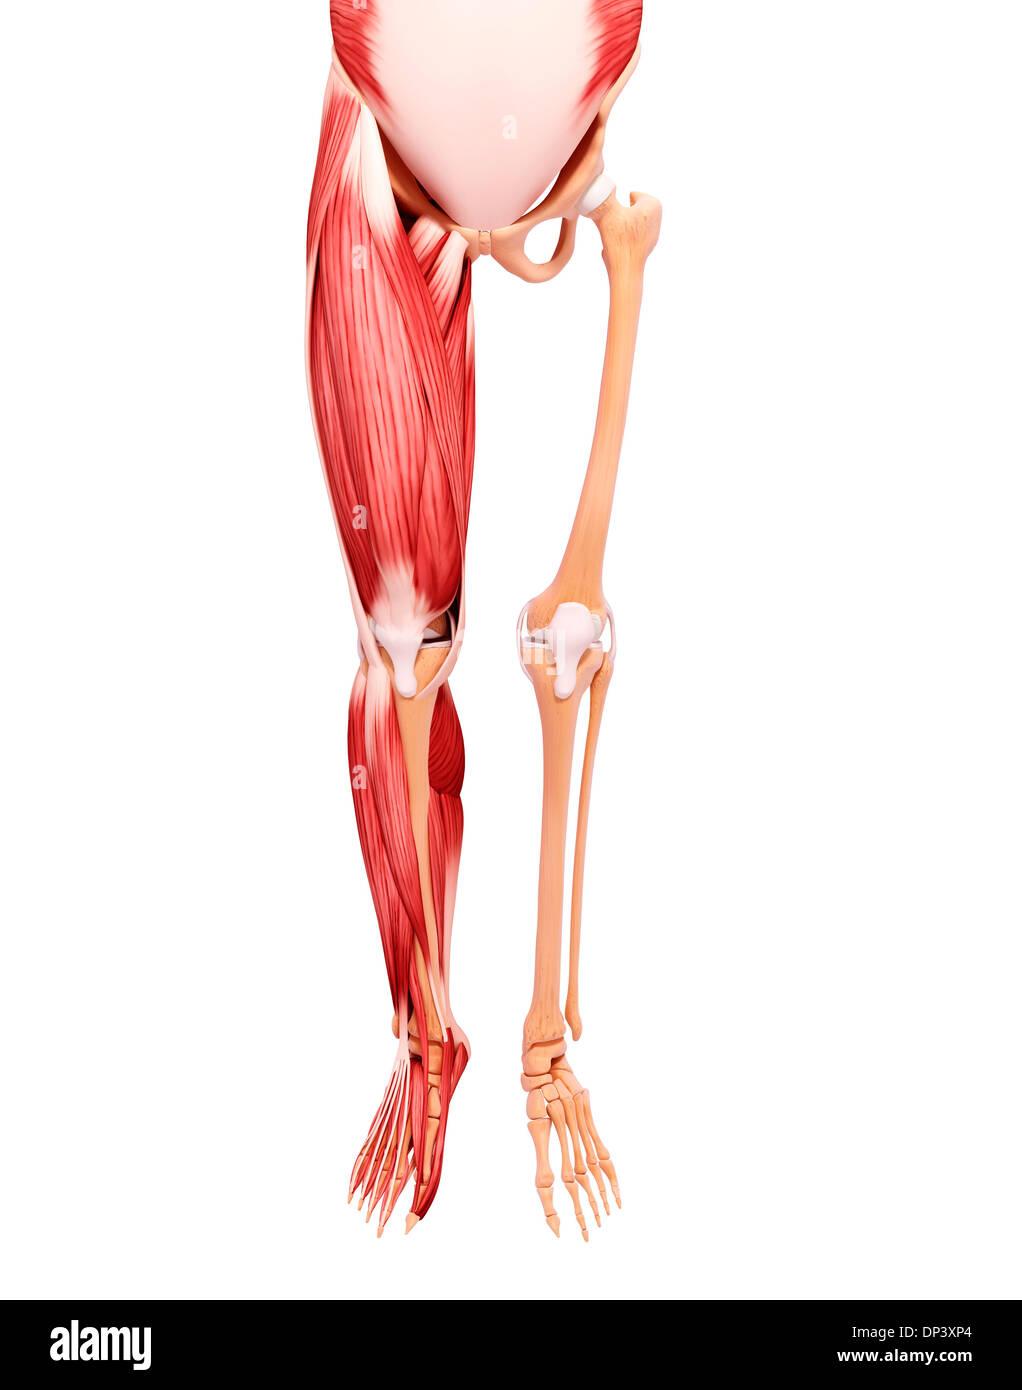 Beste Beinmuskulatur Quiz Ideen - Anatomie Ideen - finotti.info